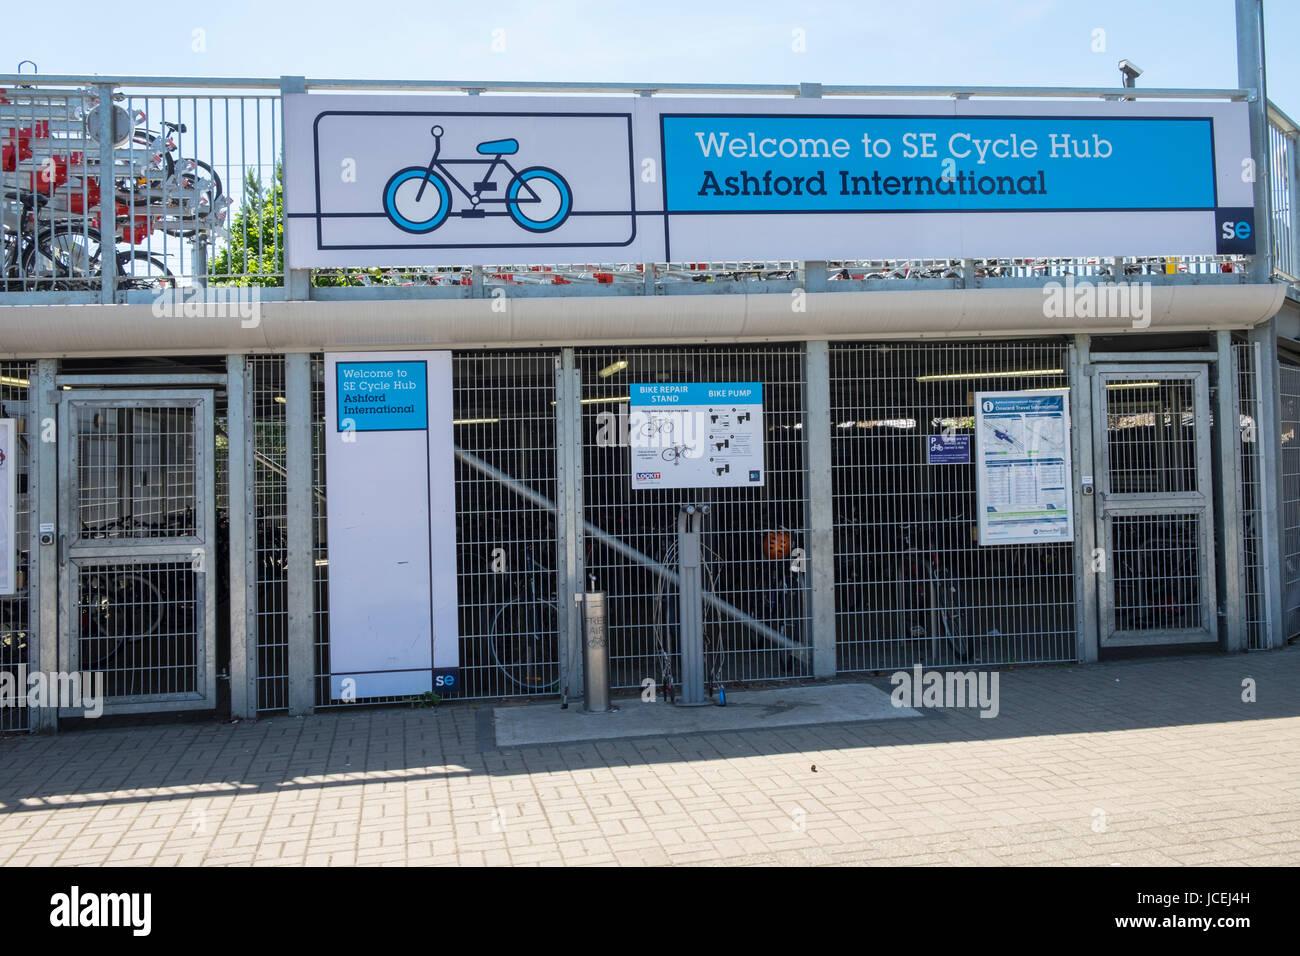 Welcome to SE cycle hub ashford international. uk - Stock Image